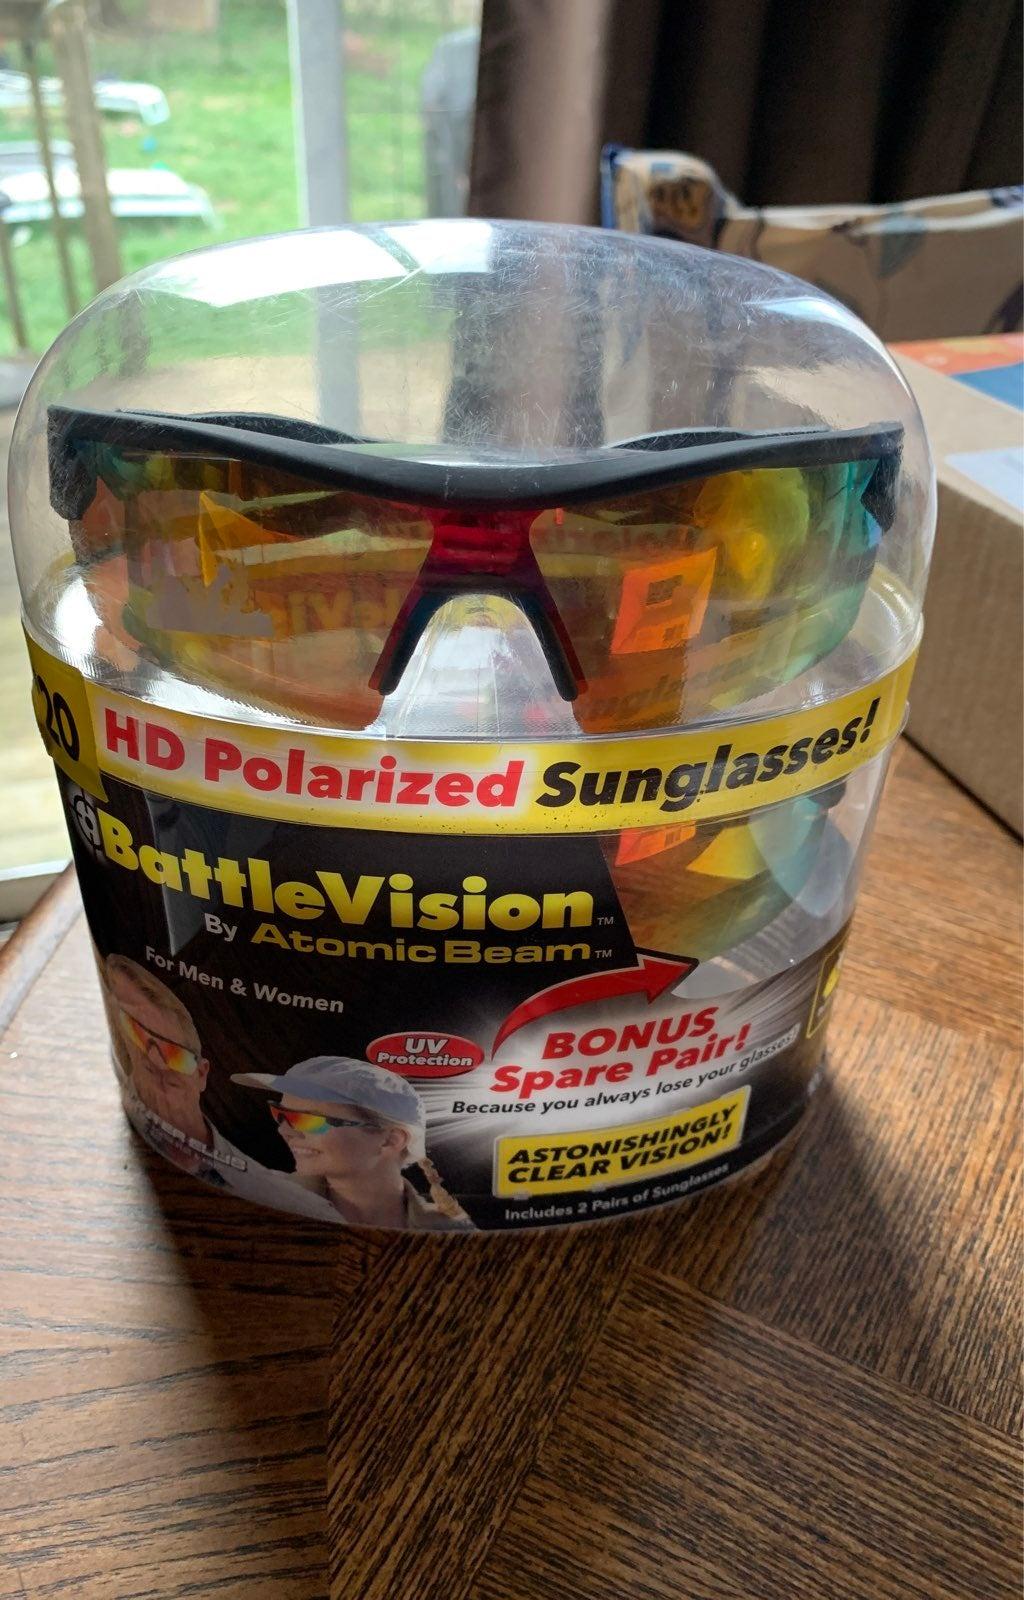 HD Polarized sunglasses for F/M.